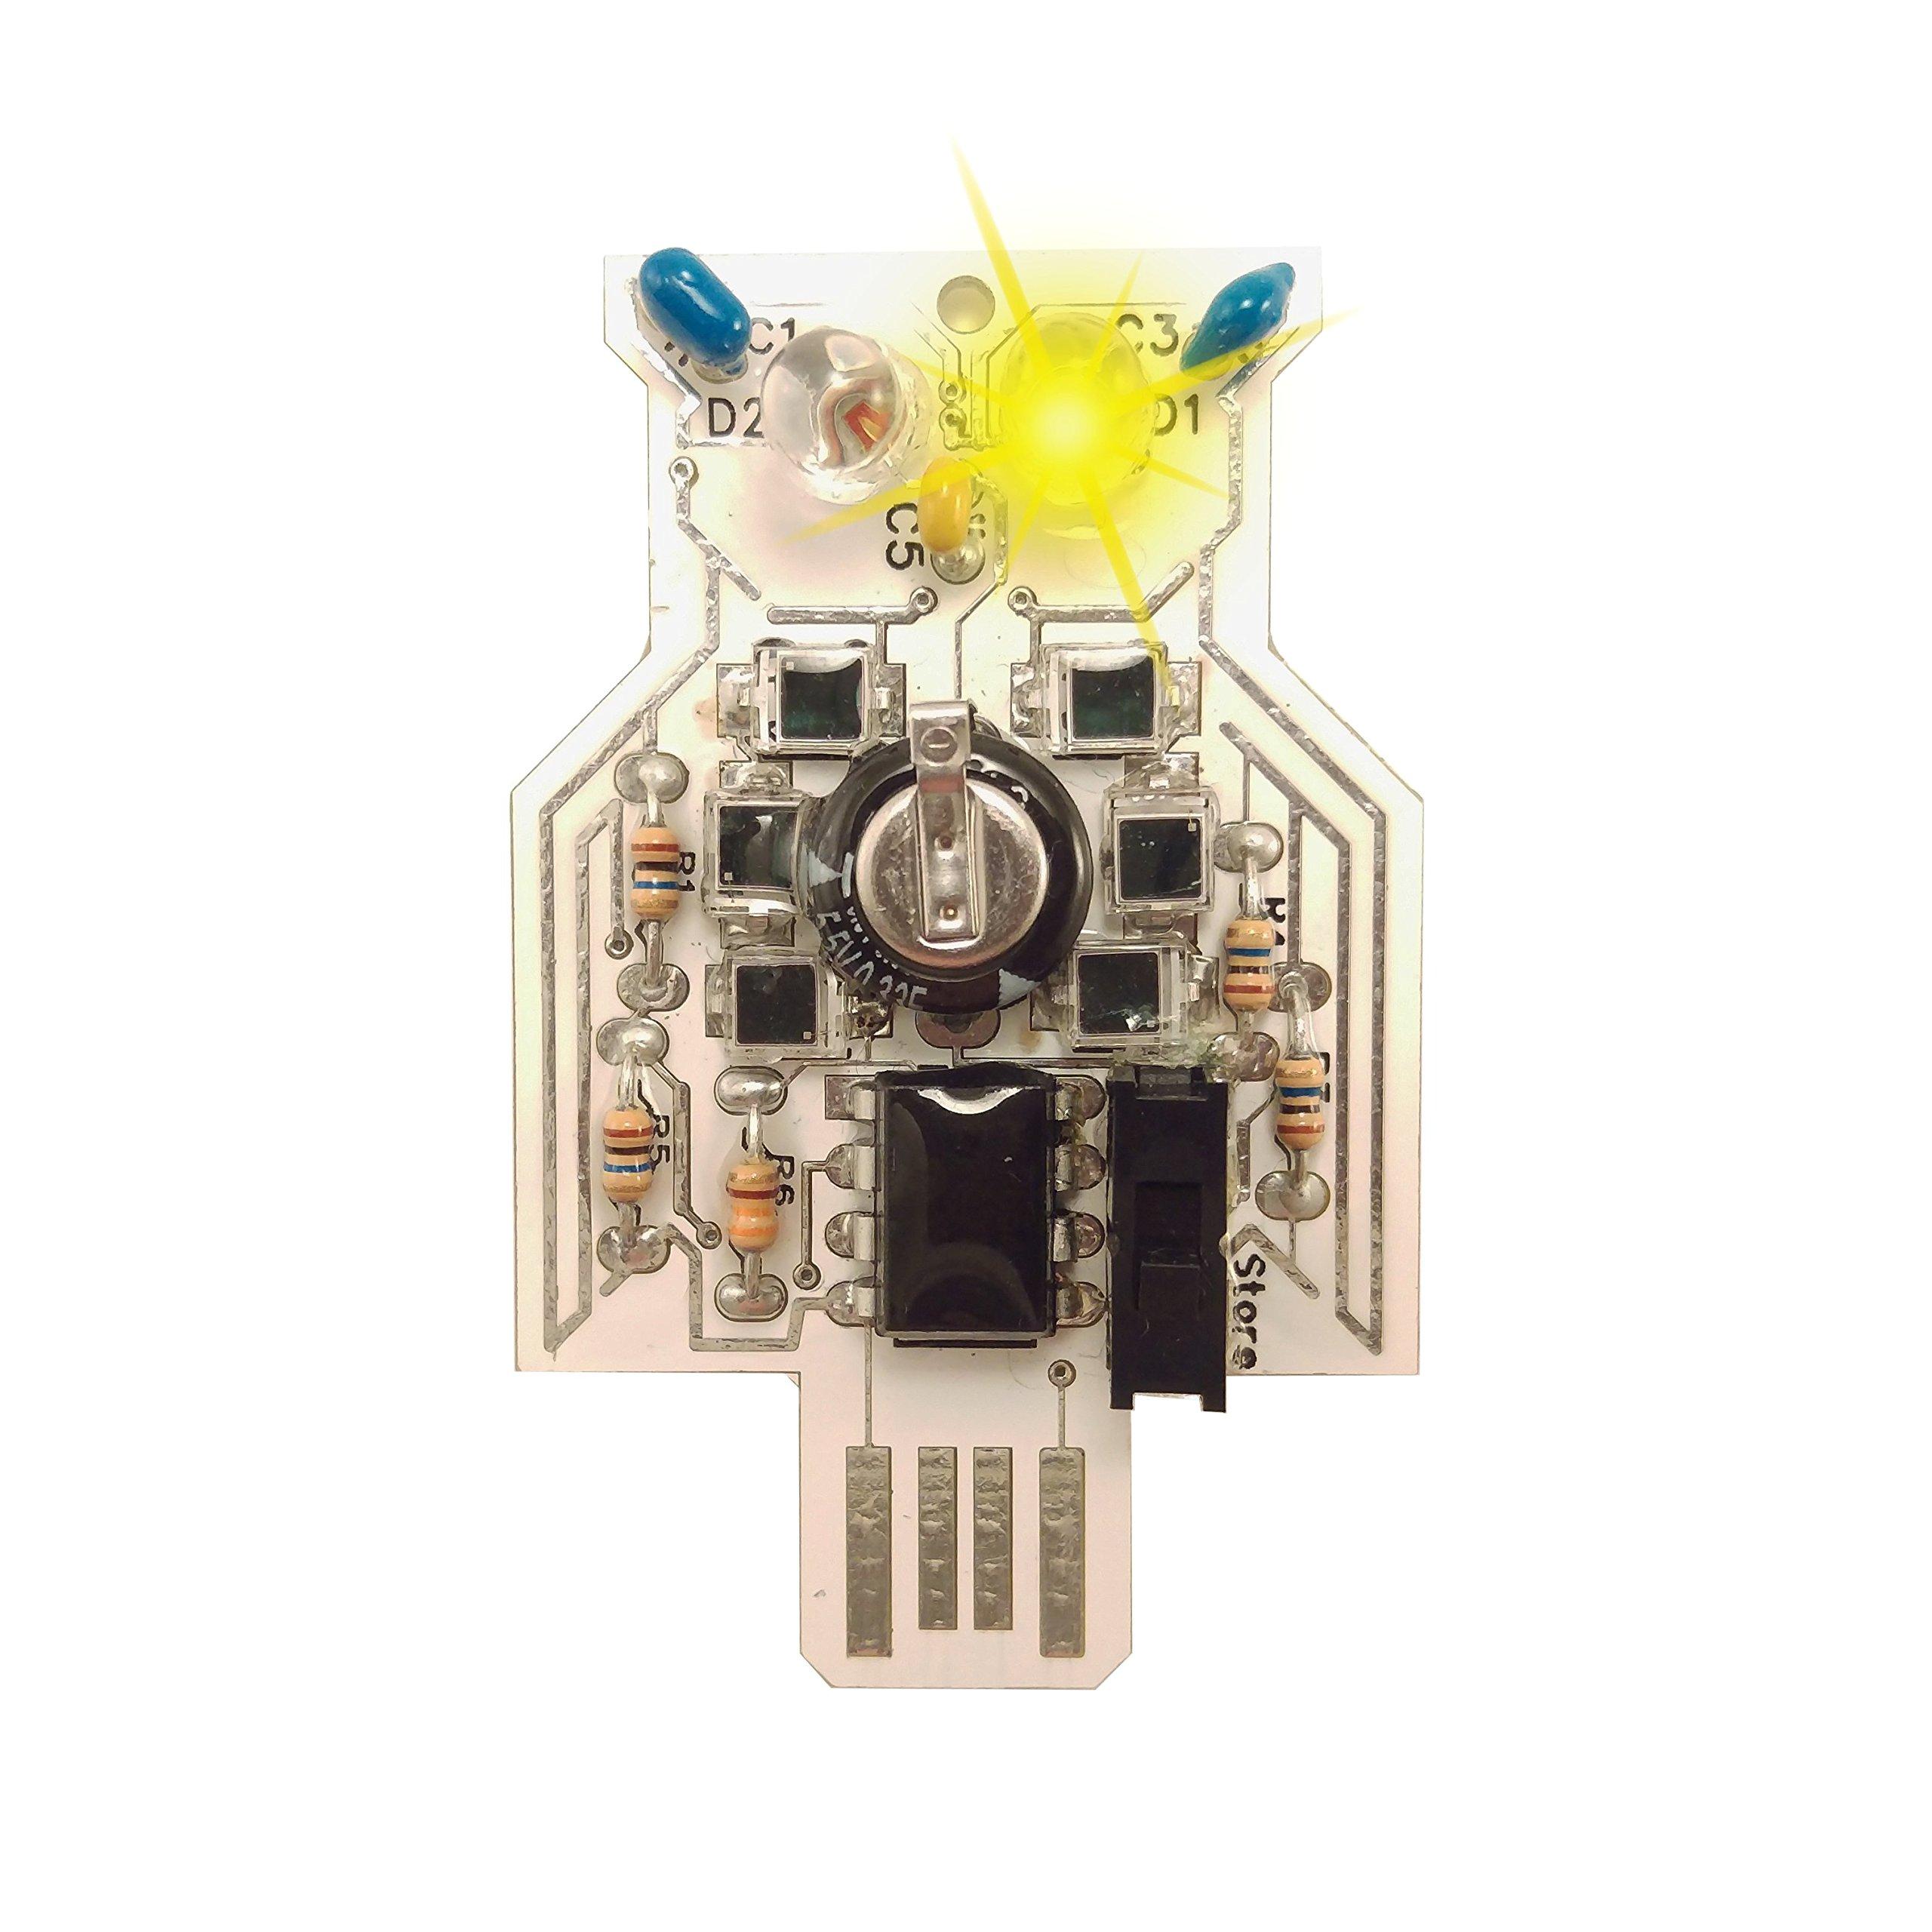 Lumen Electronic Jewelry Intermediate Soldering kit, Solar Powered LED OWL